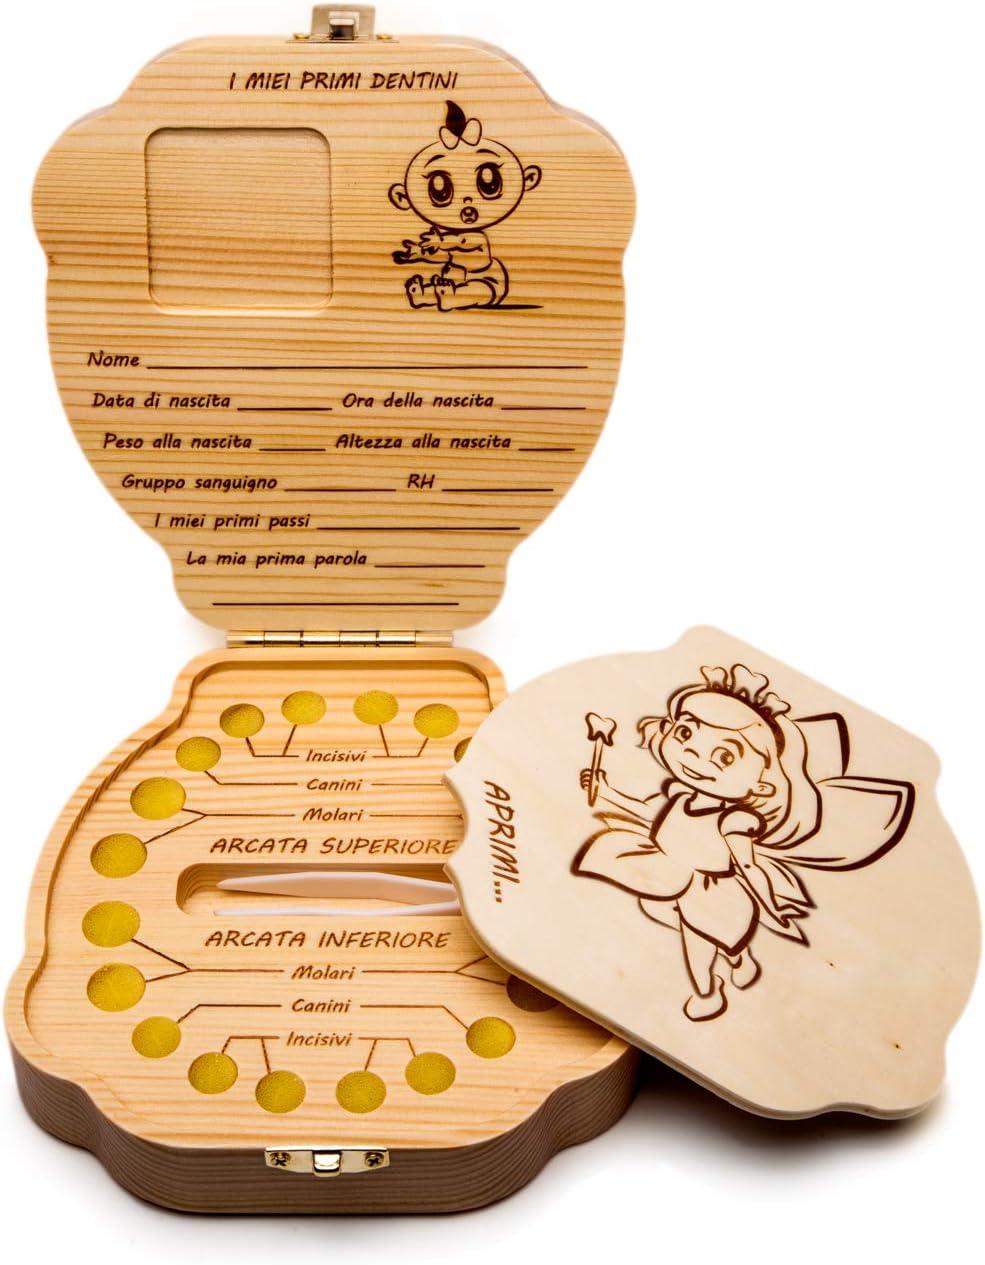 ideal como regalo de bautizo o beb/é juegos para ni/ños Caja de dientes de leche italiano para regalo de ni/ña de 1 a/ño caja para fotos MAPAPY/È